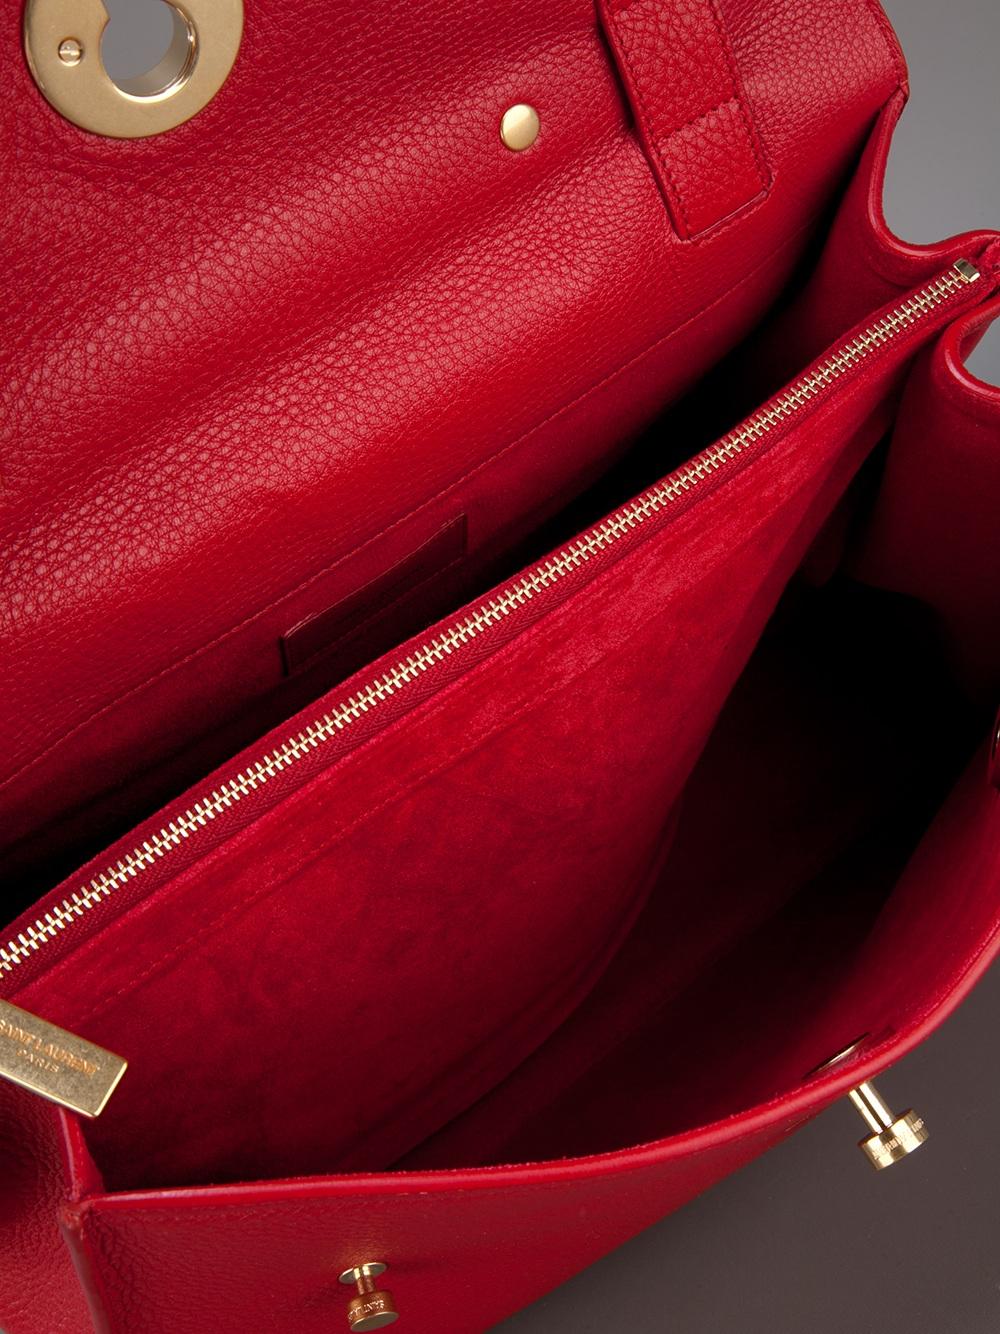 ysl clutch purse - yves saint laurent muse weekender tote, ysl chyc shoulder bag price